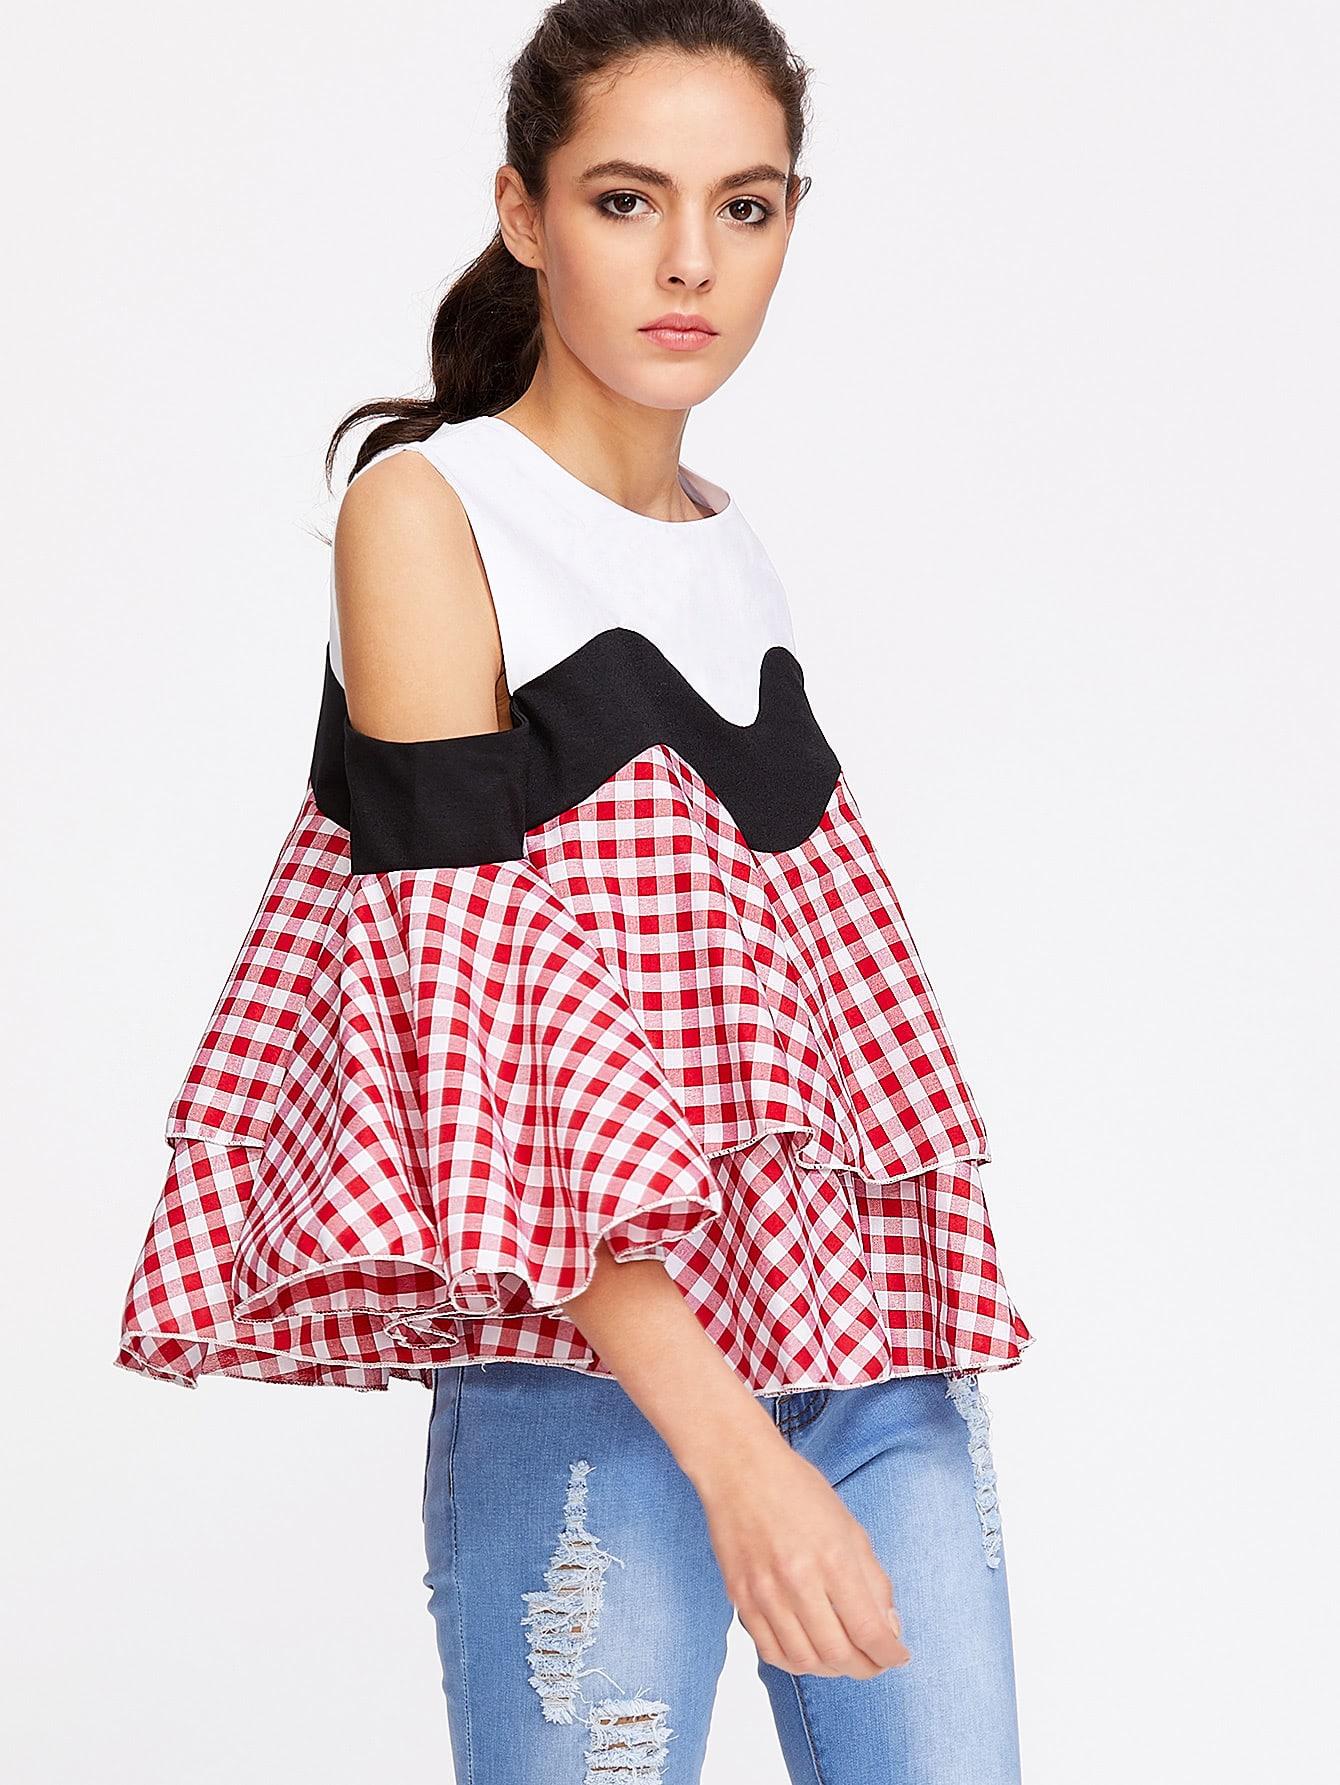 blouse170314103_2